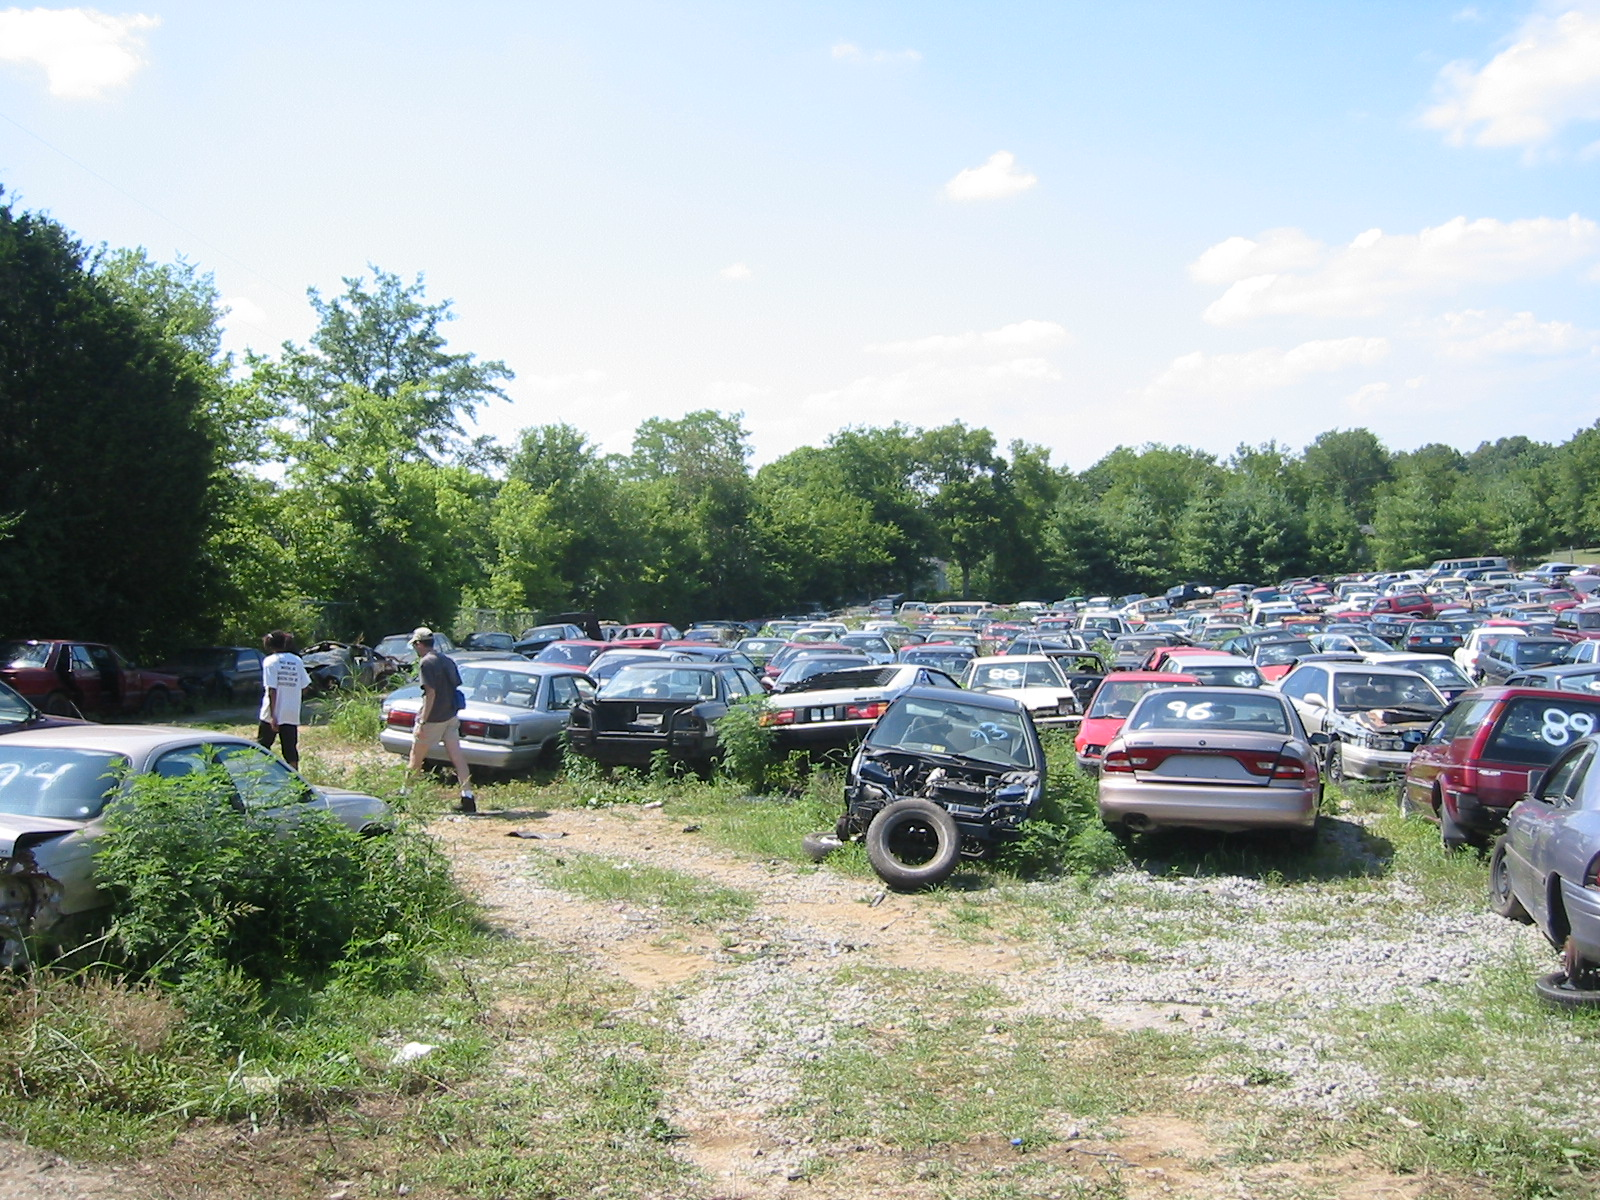 File:Junkyard in Nashville.jpg - Wikimedia Commons